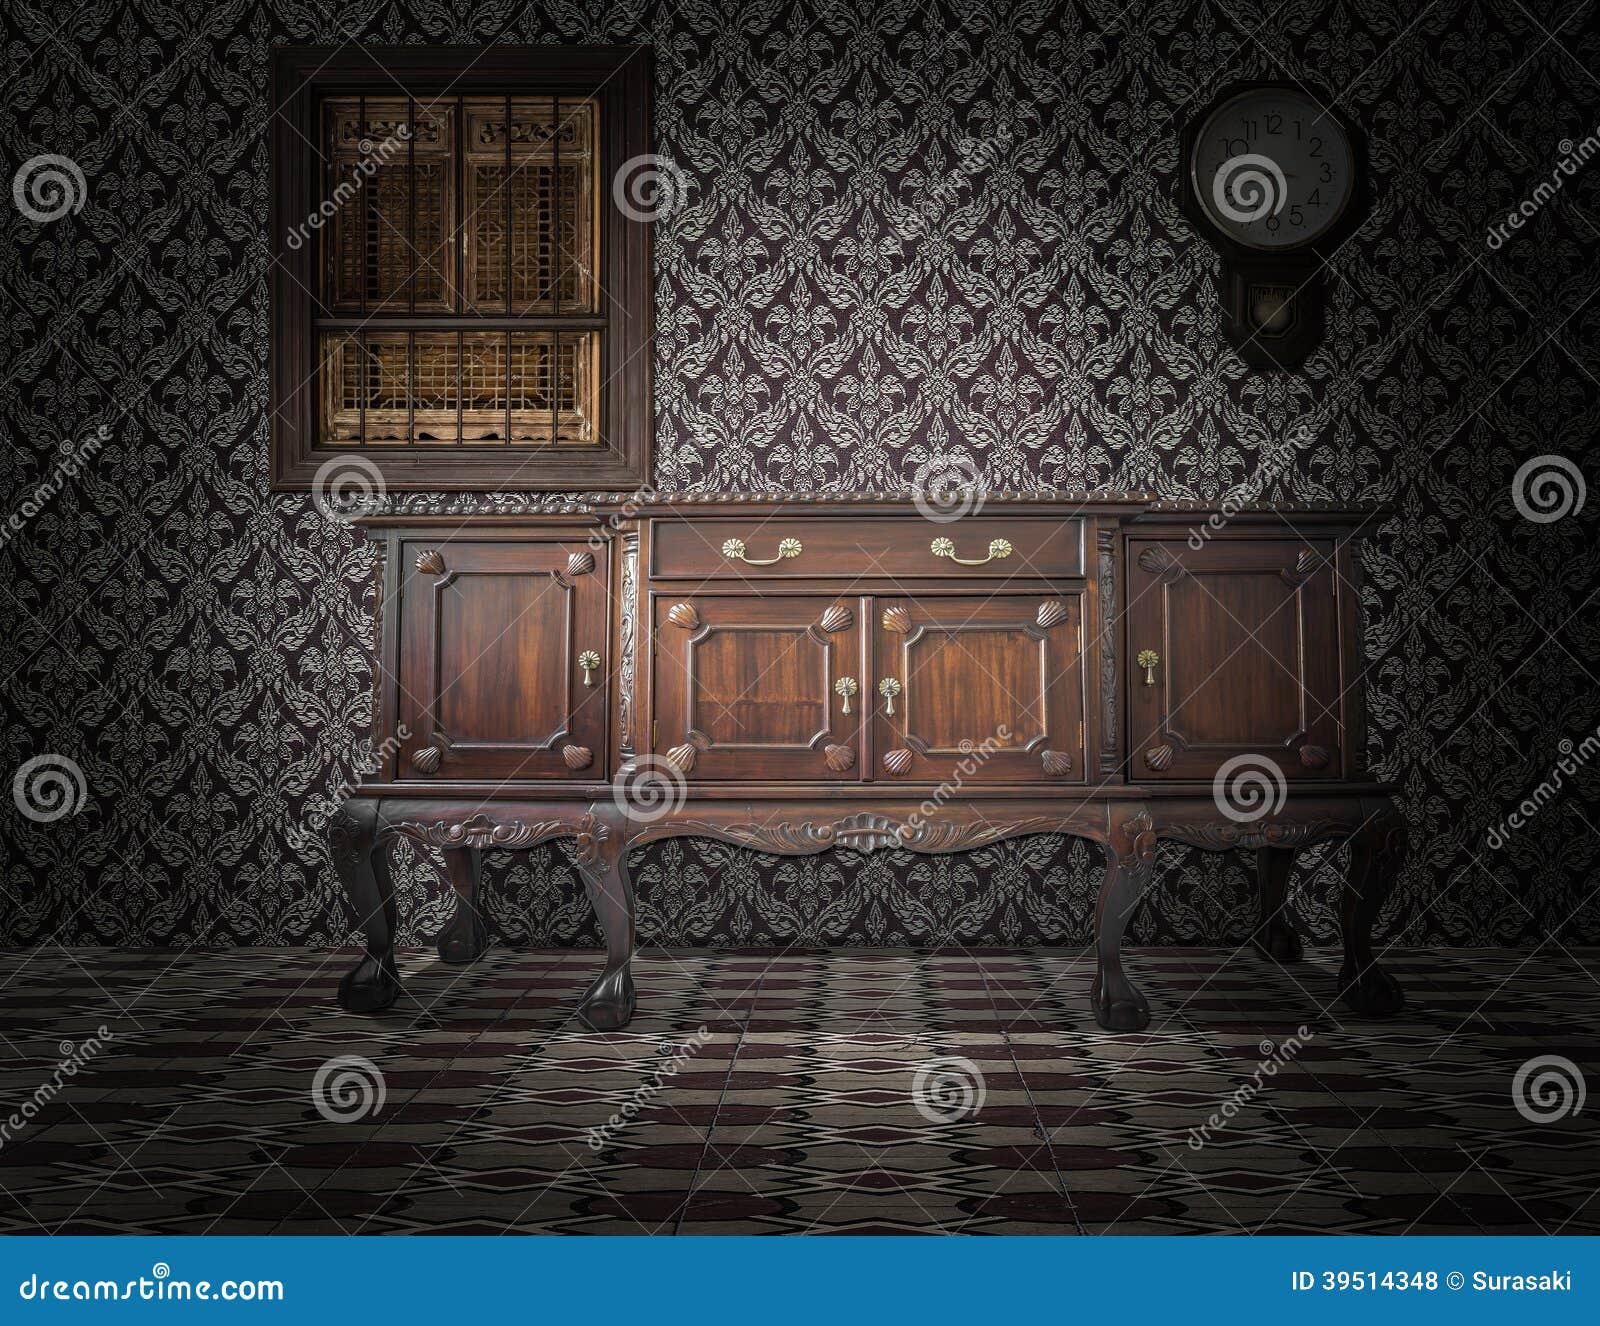 Old style interior